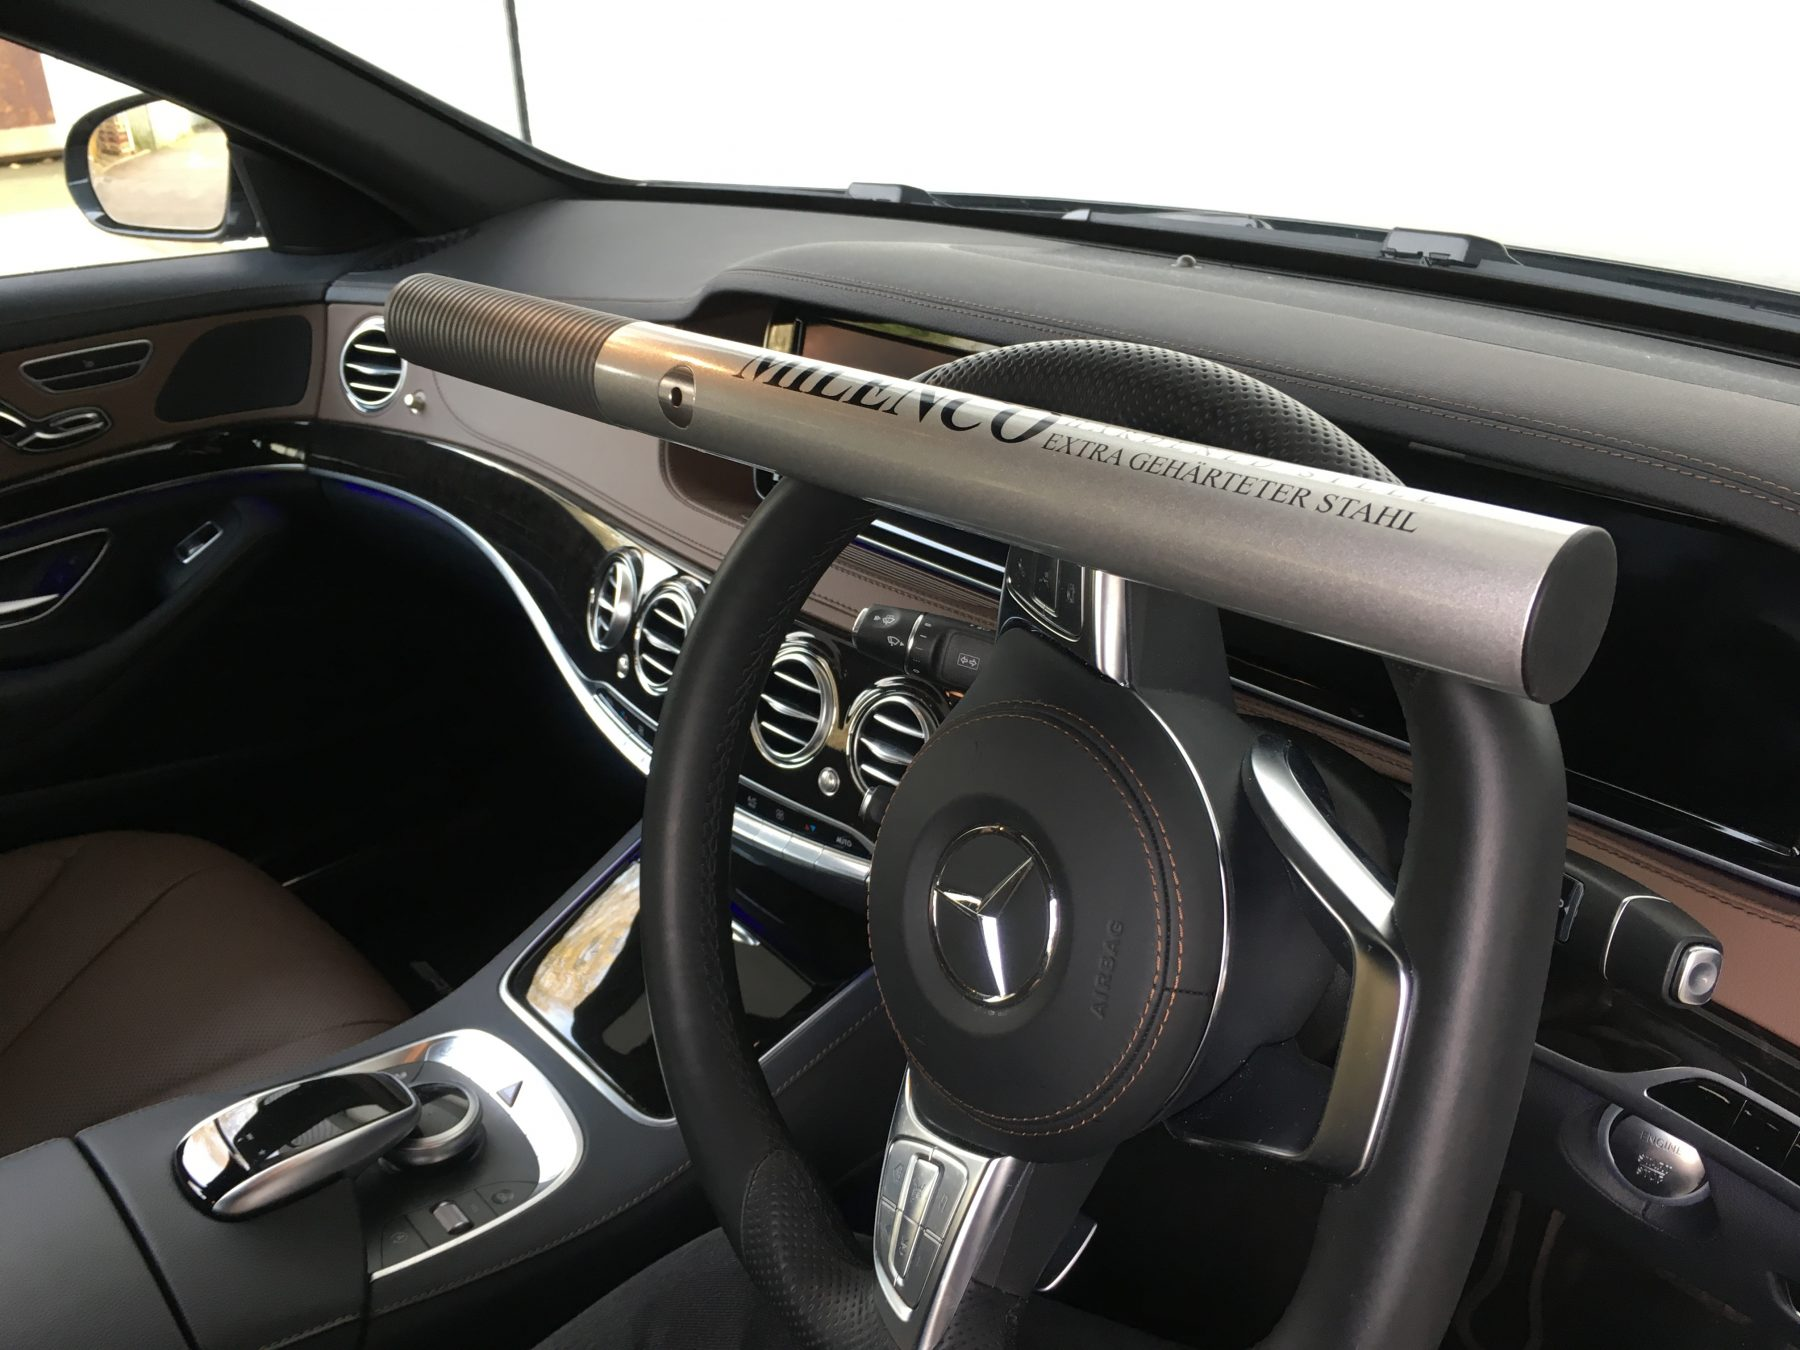 High Security Steering Wheel Lock Milenco Europe S Leading